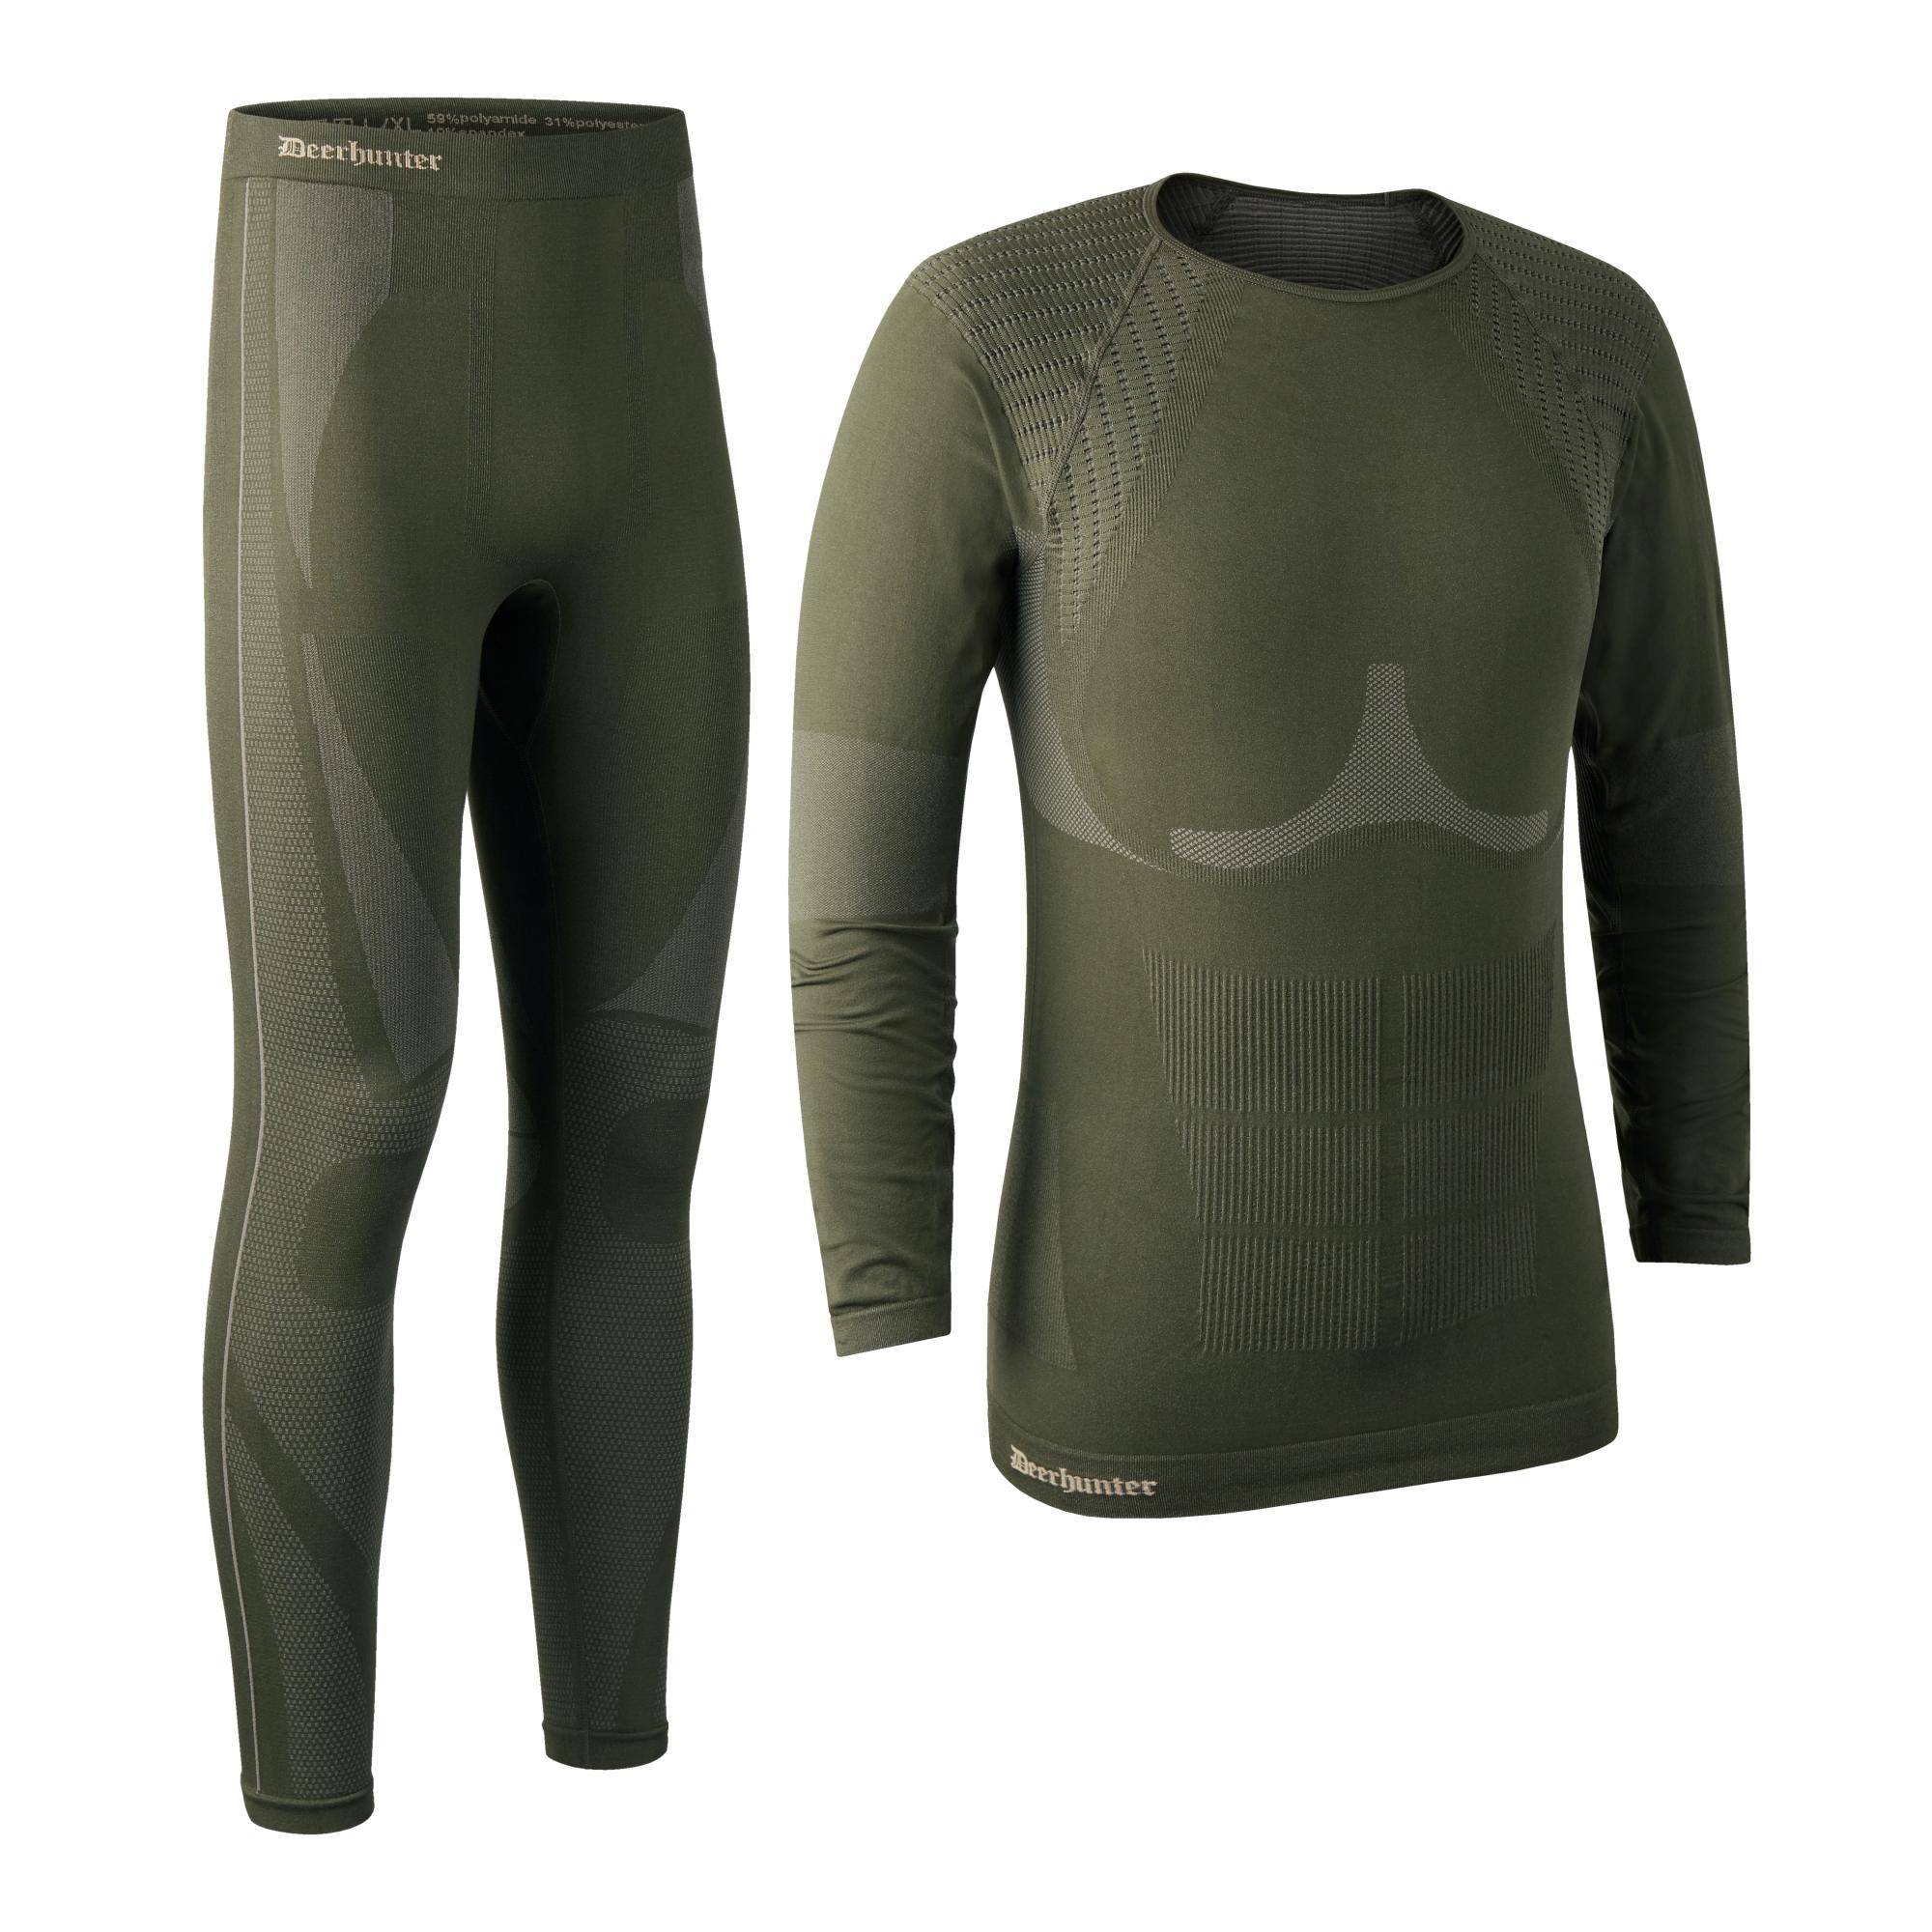 Underkläder / Underställ - Jakt & Vildmark